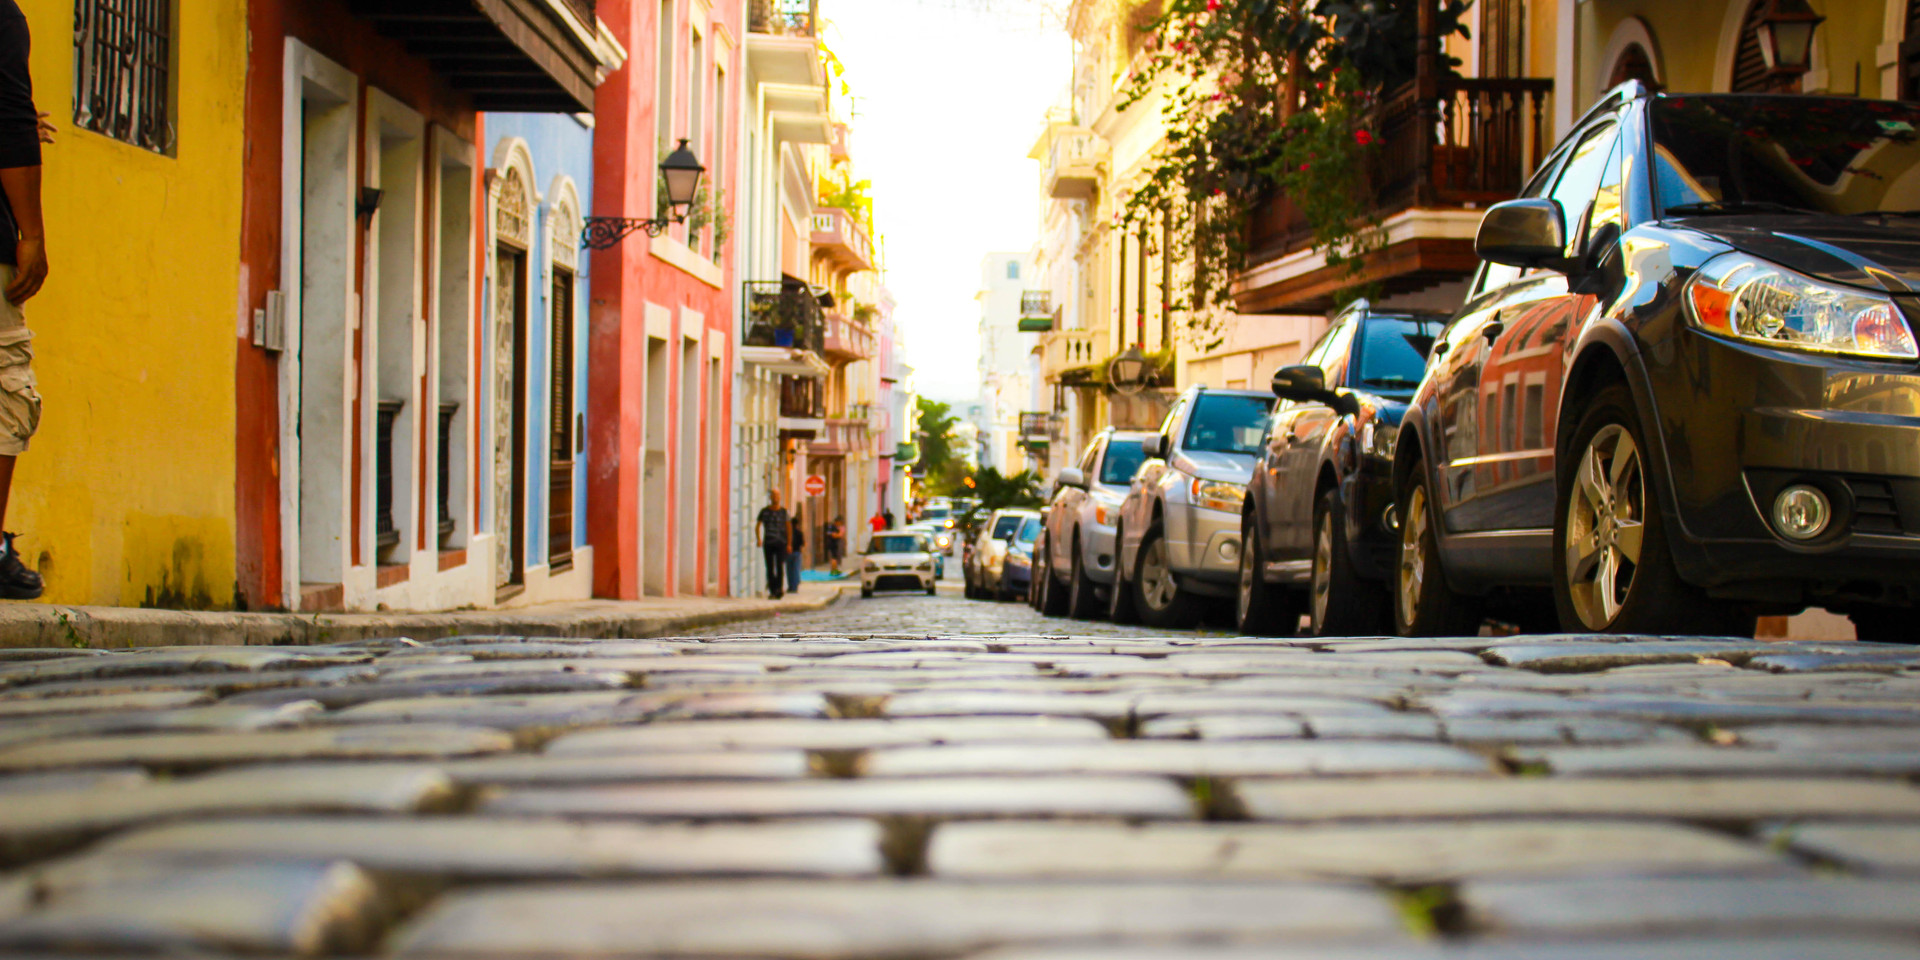 A walk in Old San Juan